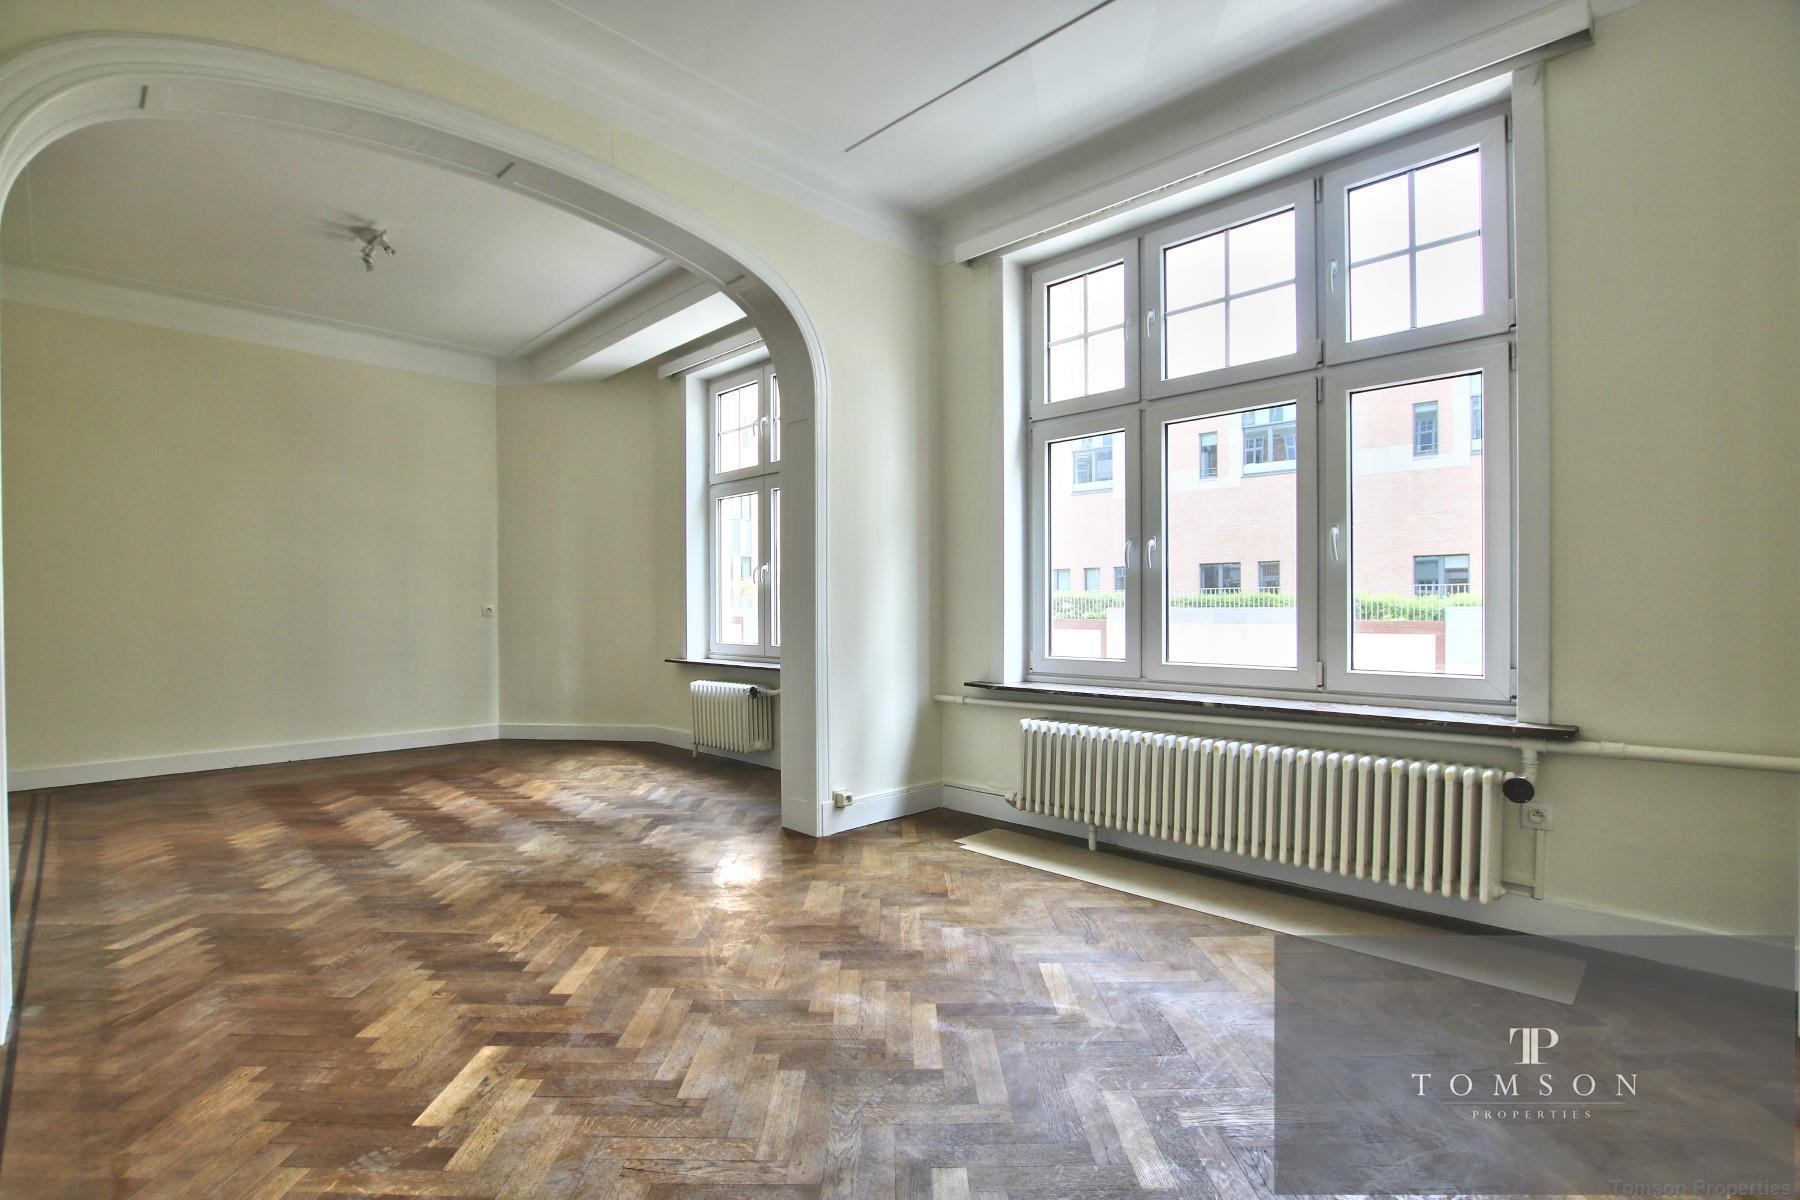 Flat - Etterbeek - #4313596-1